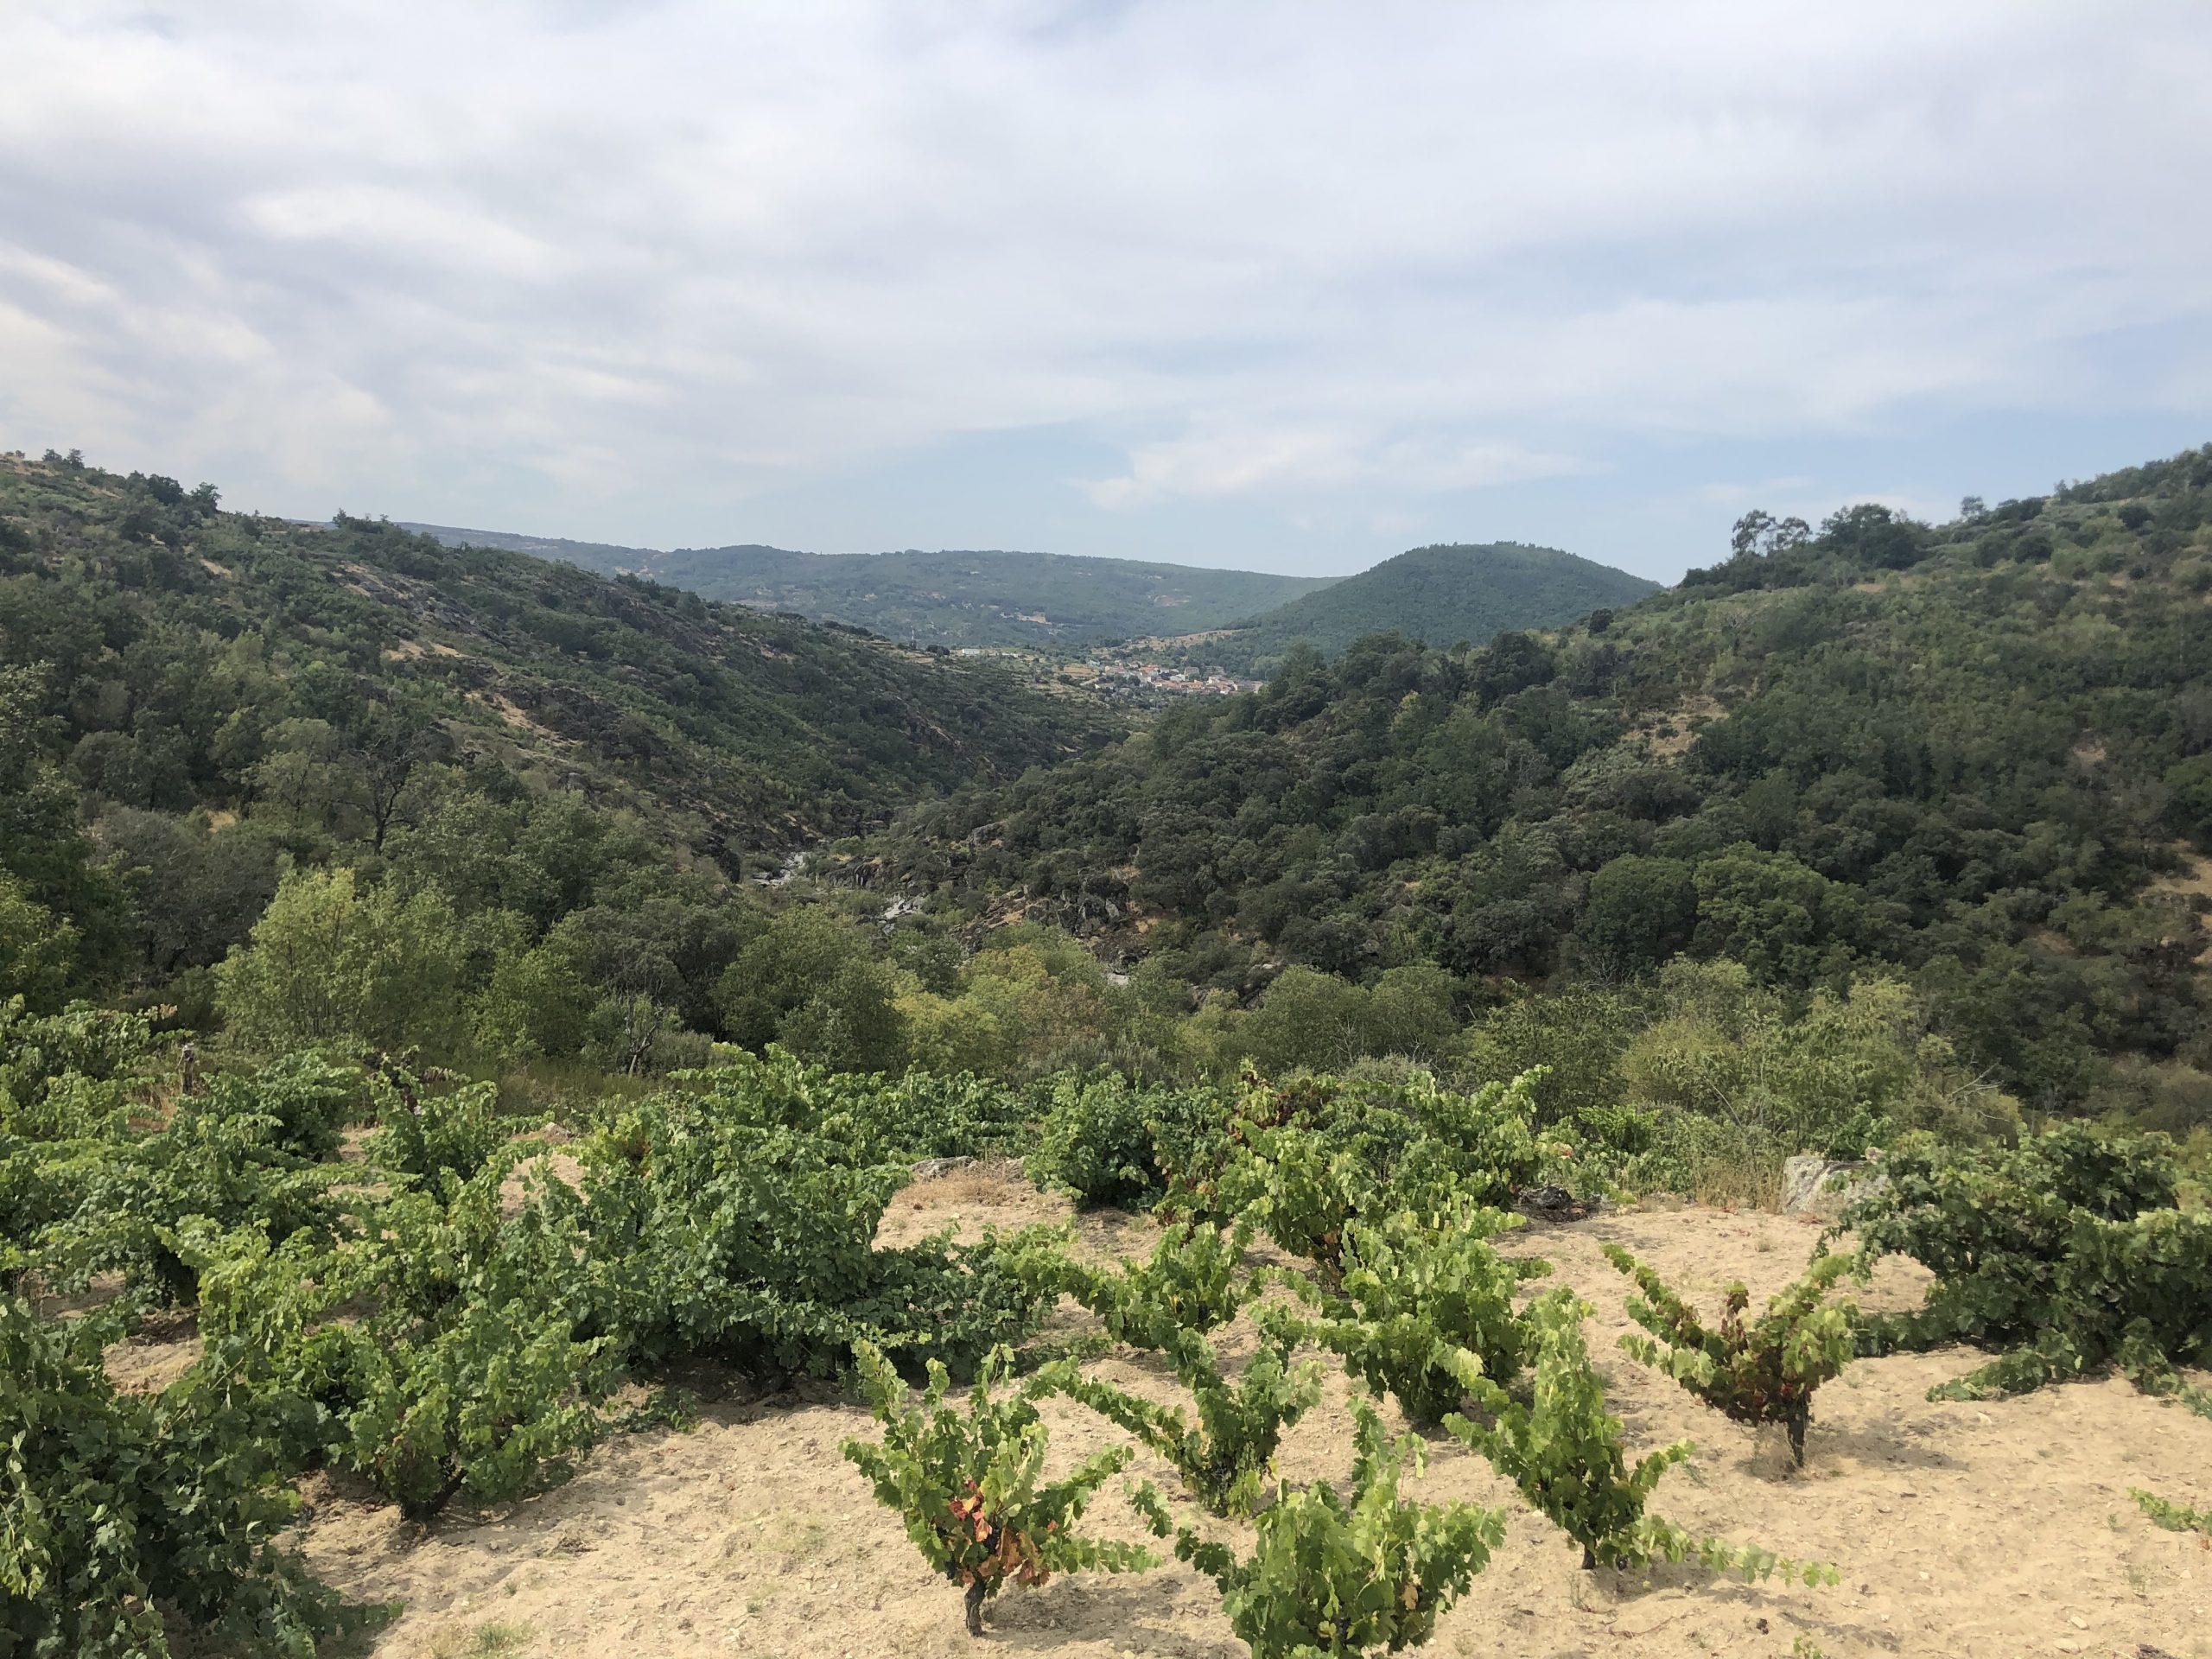 Paisaje de la Sierra de Salamanca con viñedos